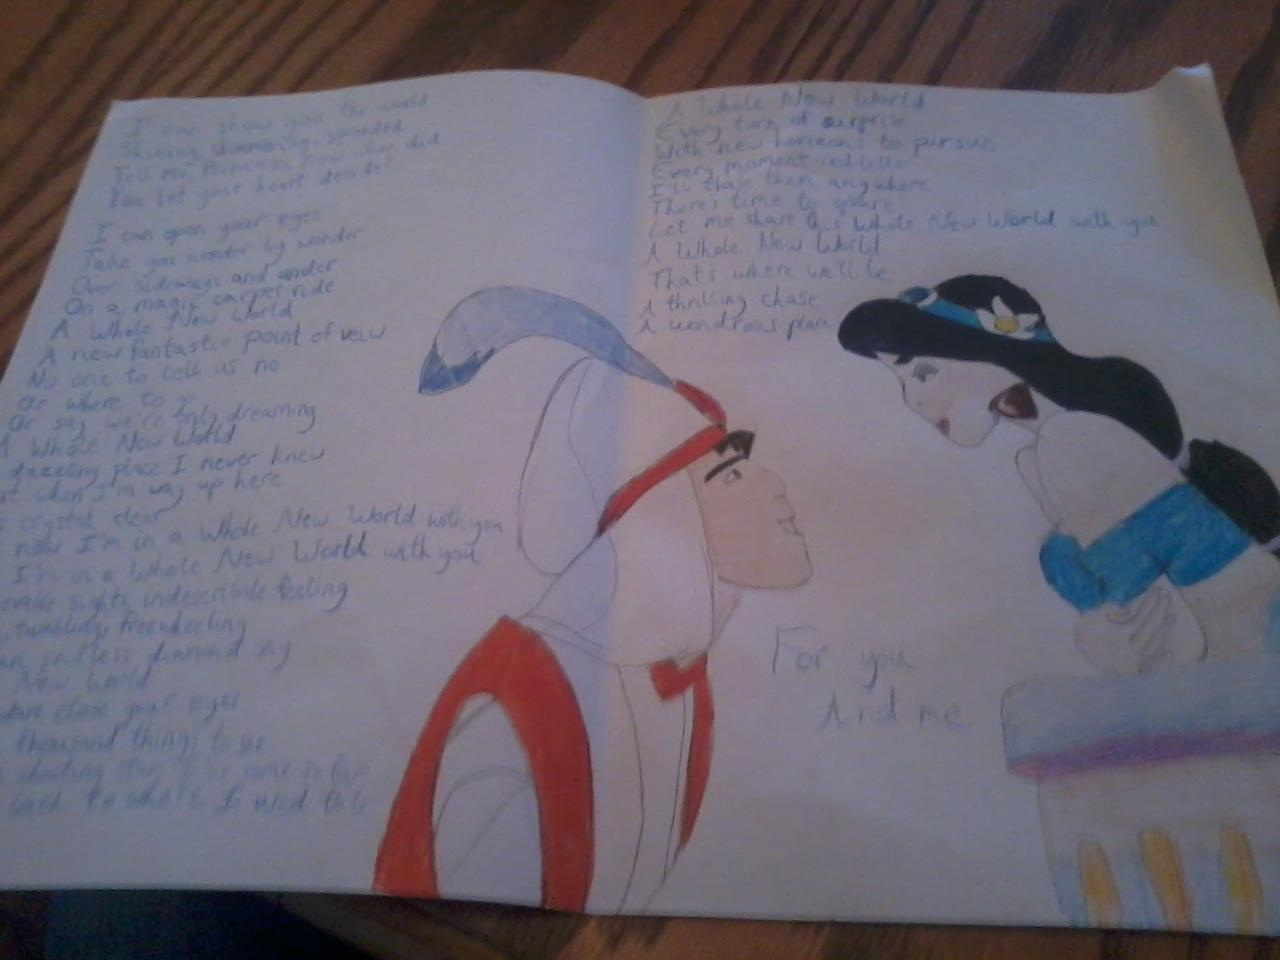 Disney Princess Images Aladdin Birthday Card Hd Wallpaper And